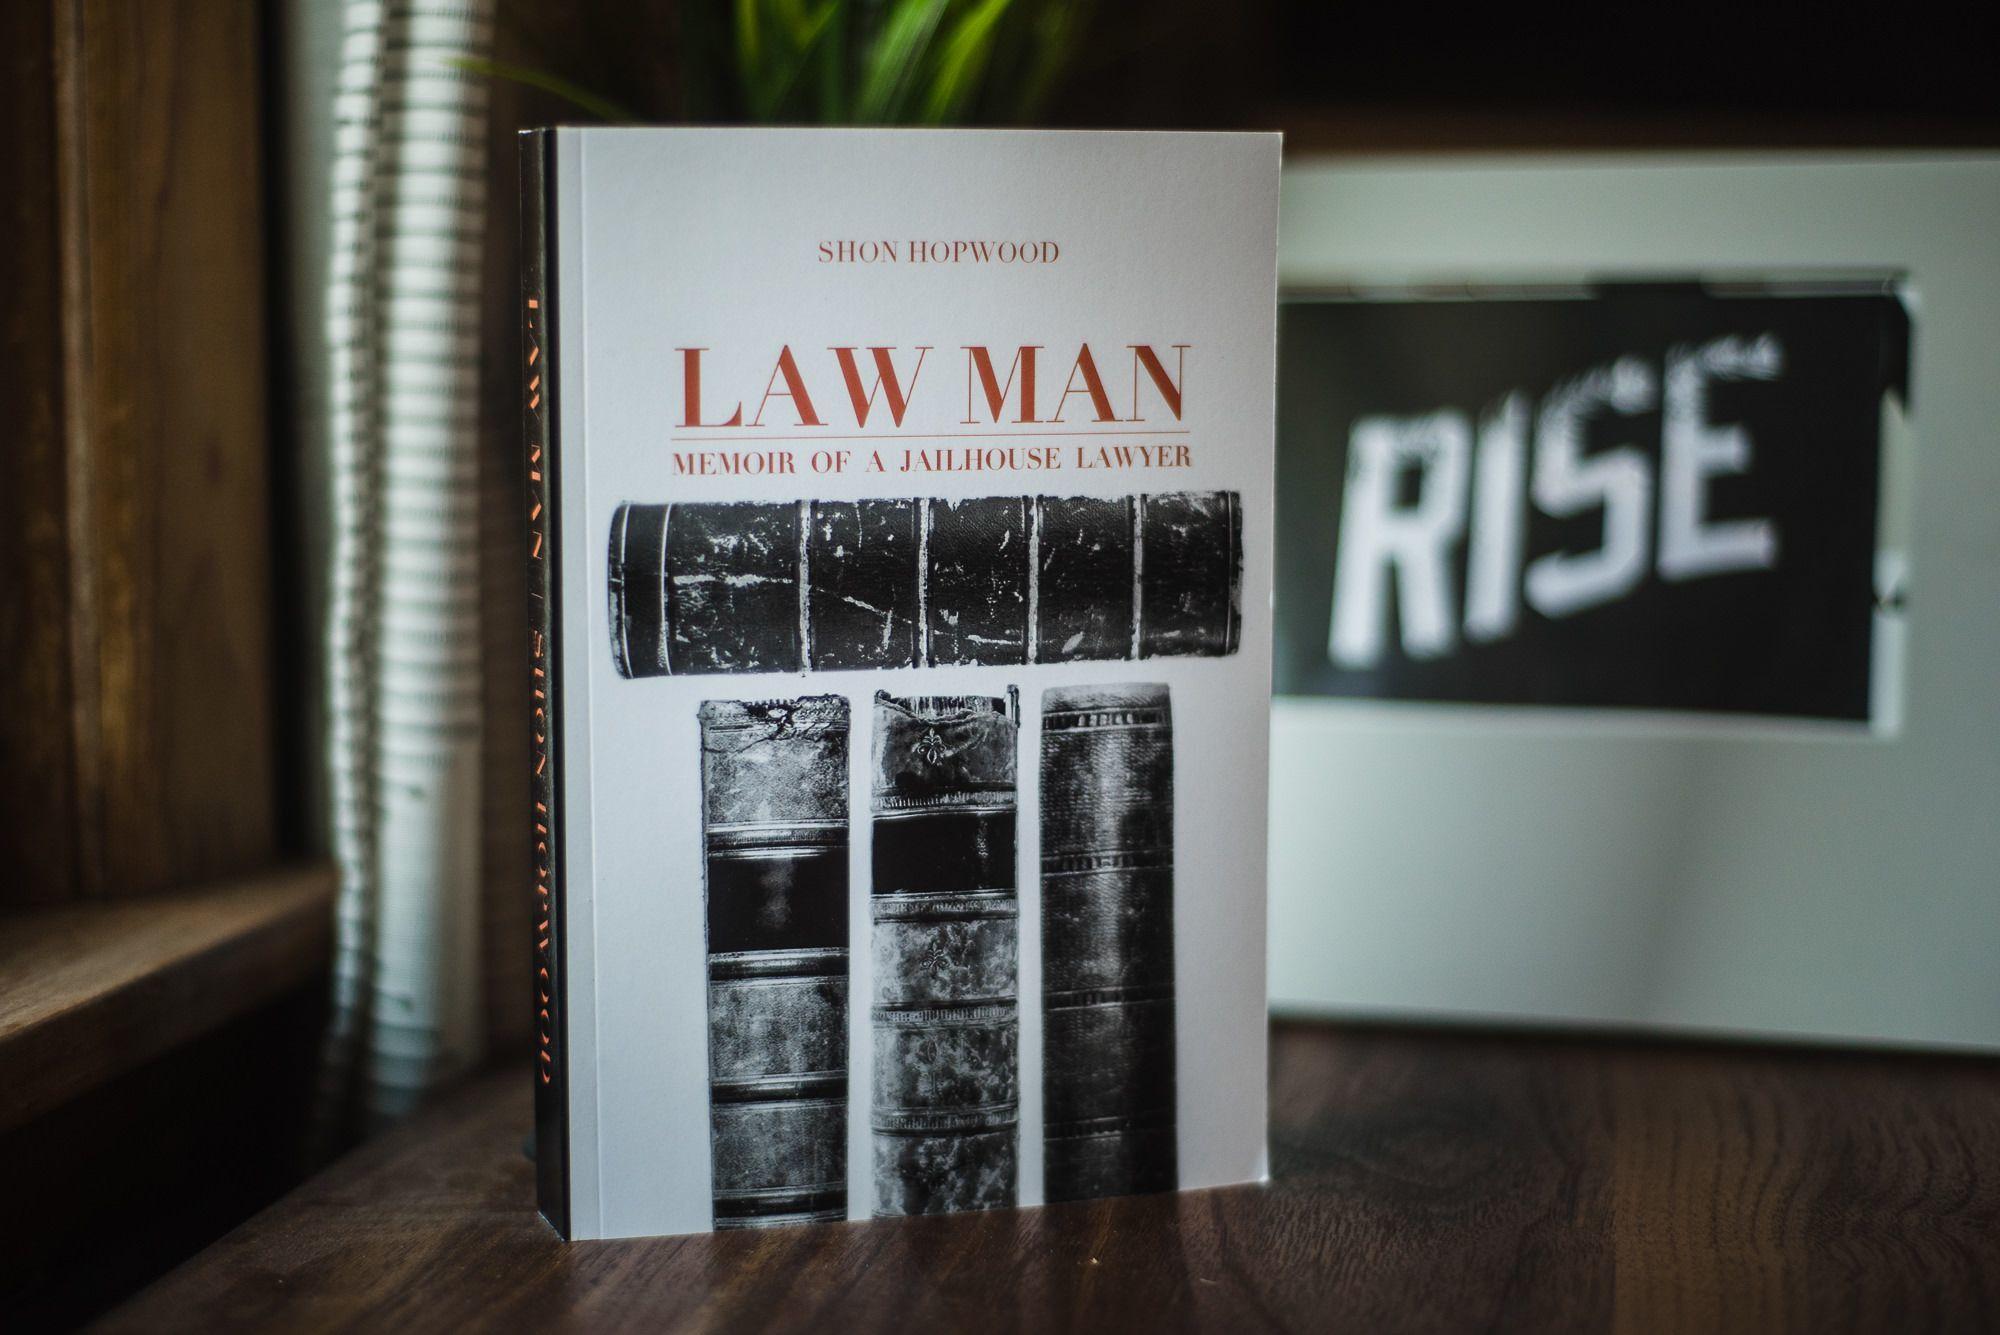 Q3 Law Man: Memoir of a Jailhouse Lawyer